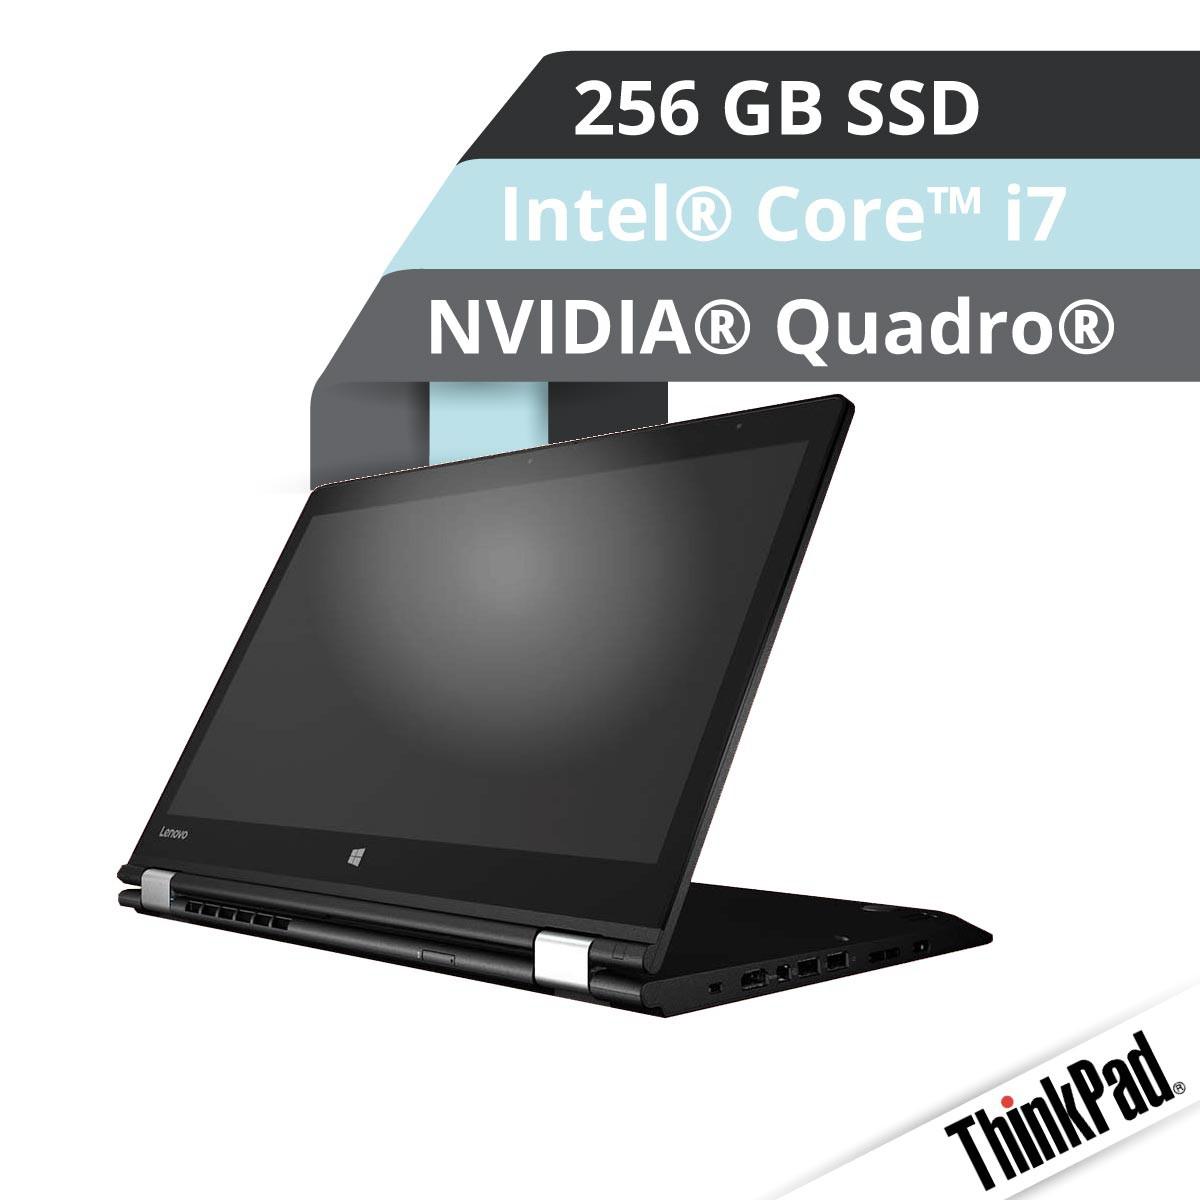 Lenovo™ ThinkPad® Yoga P40 Multimode Workstation Modell 20GQ-0004 Demoartikel